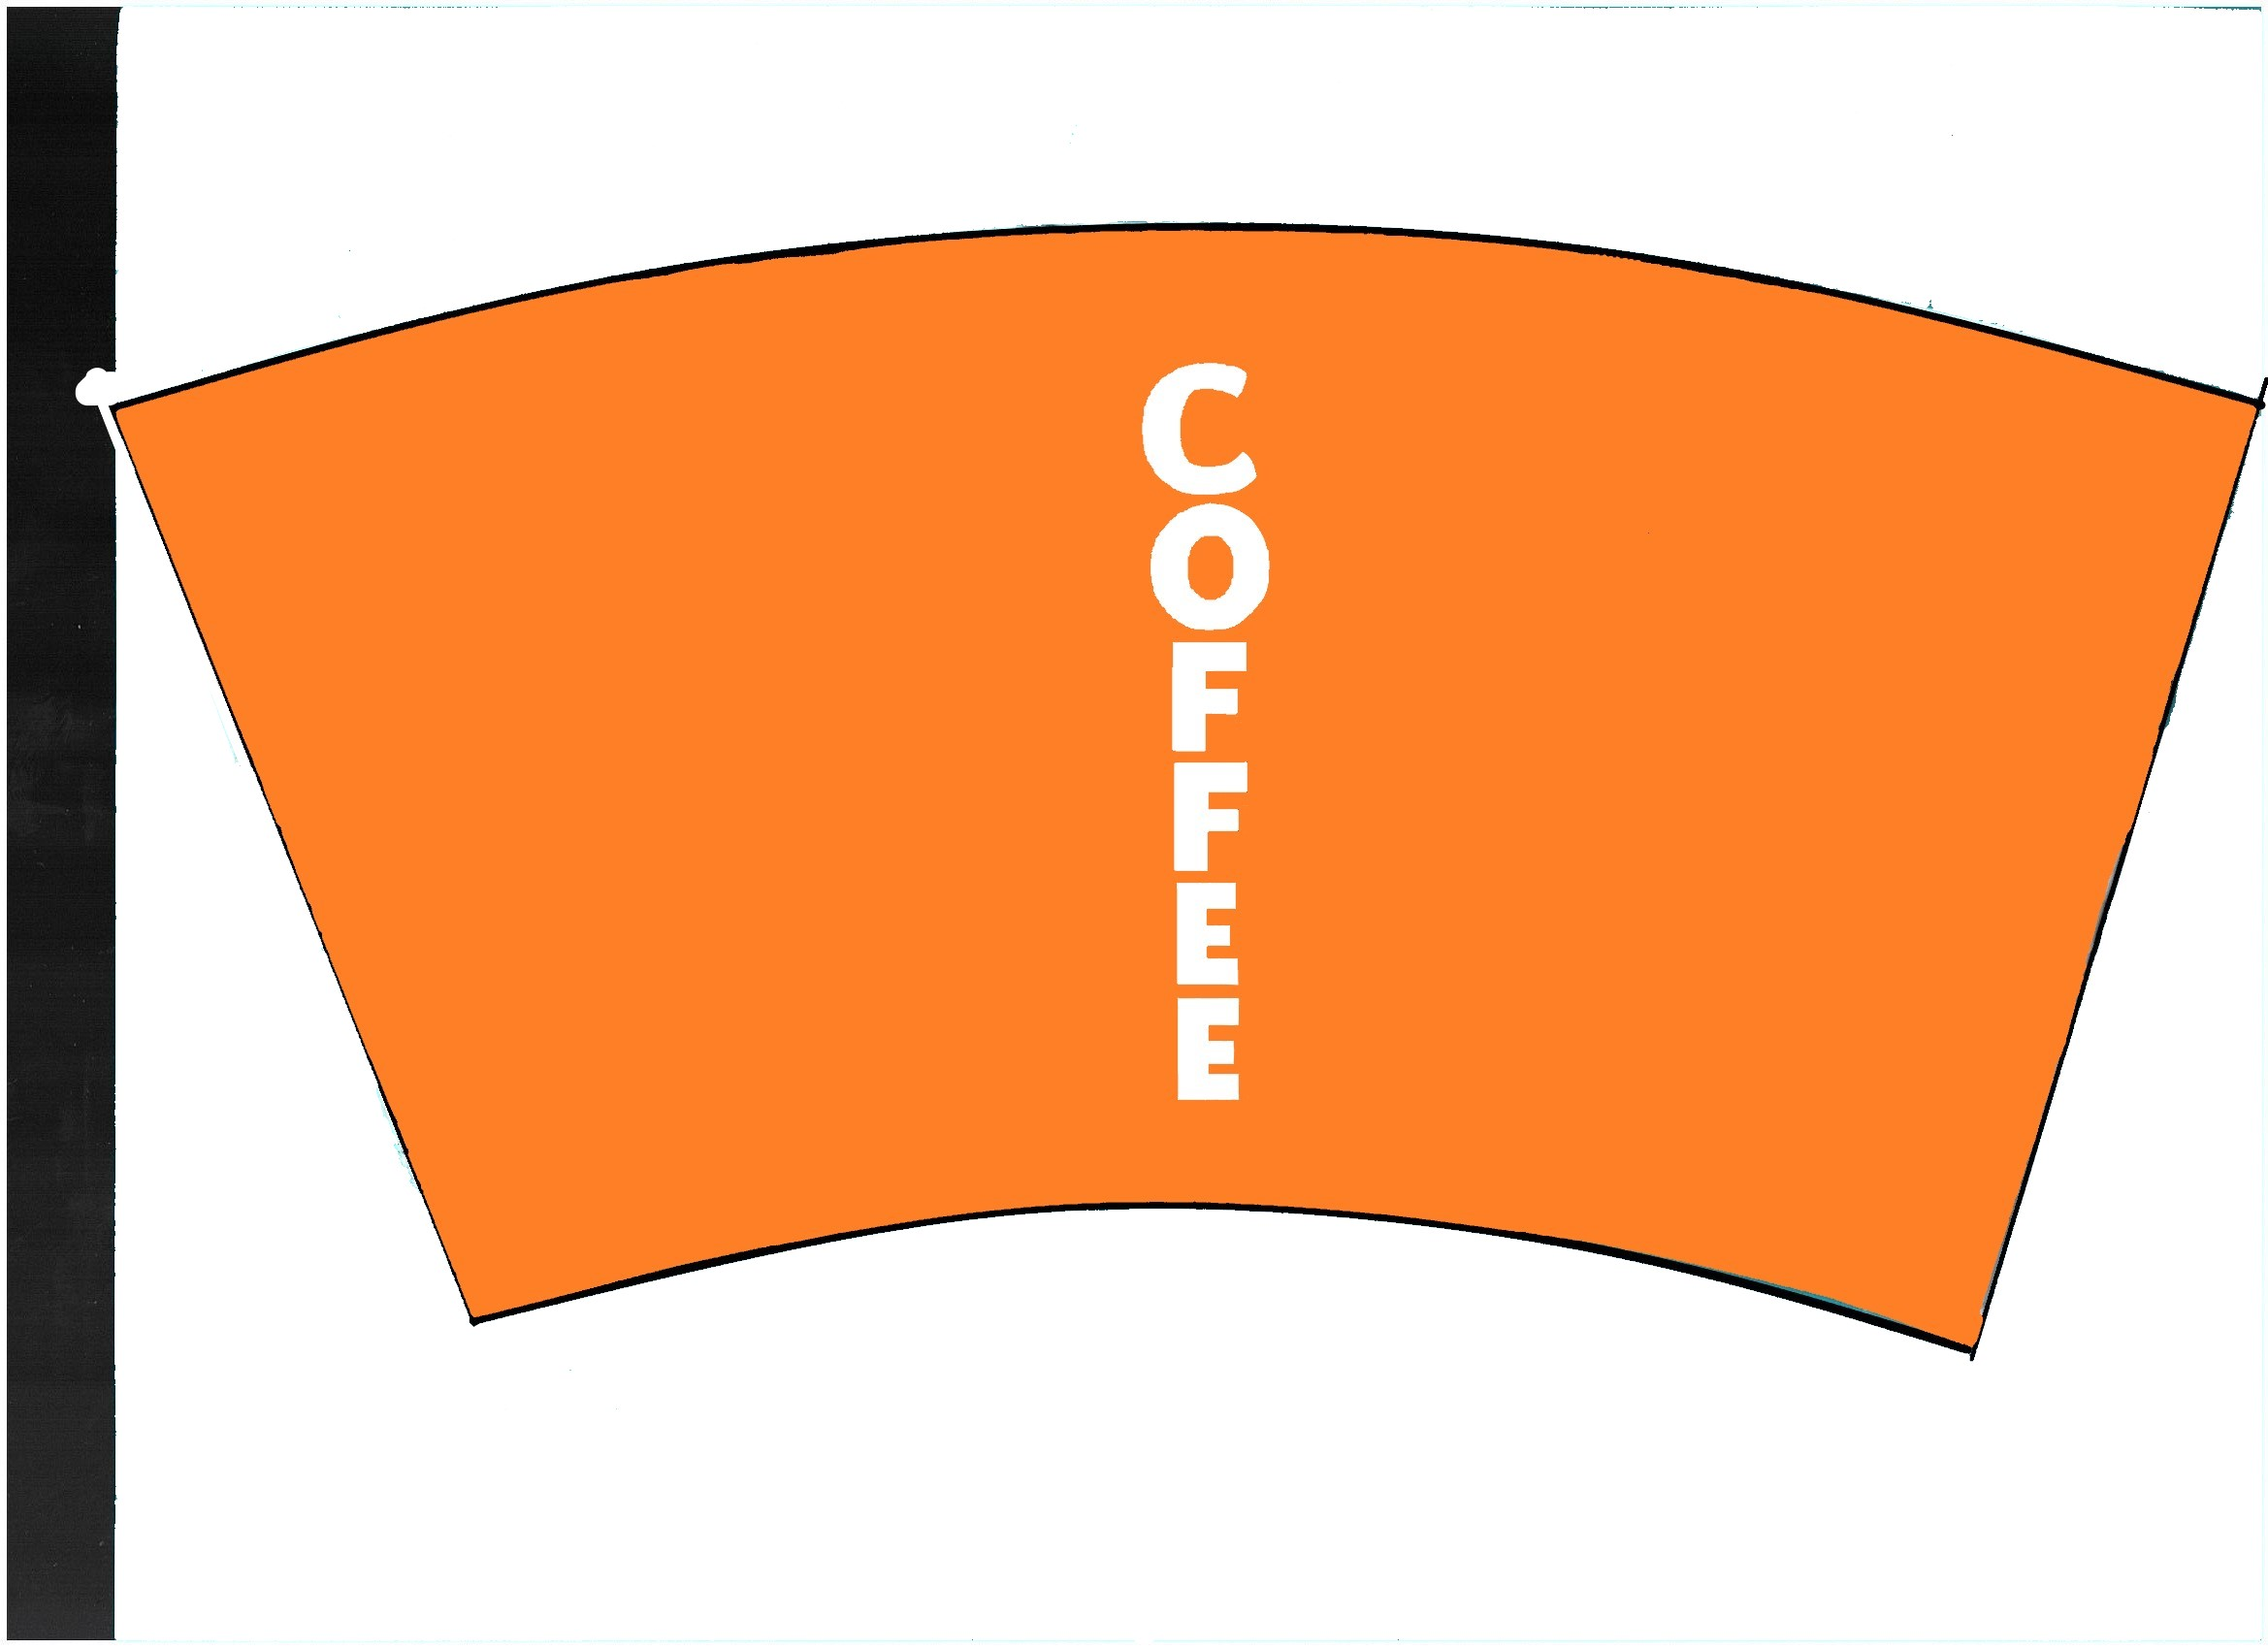 CoffeeCloseLatestCleanedup.jpg